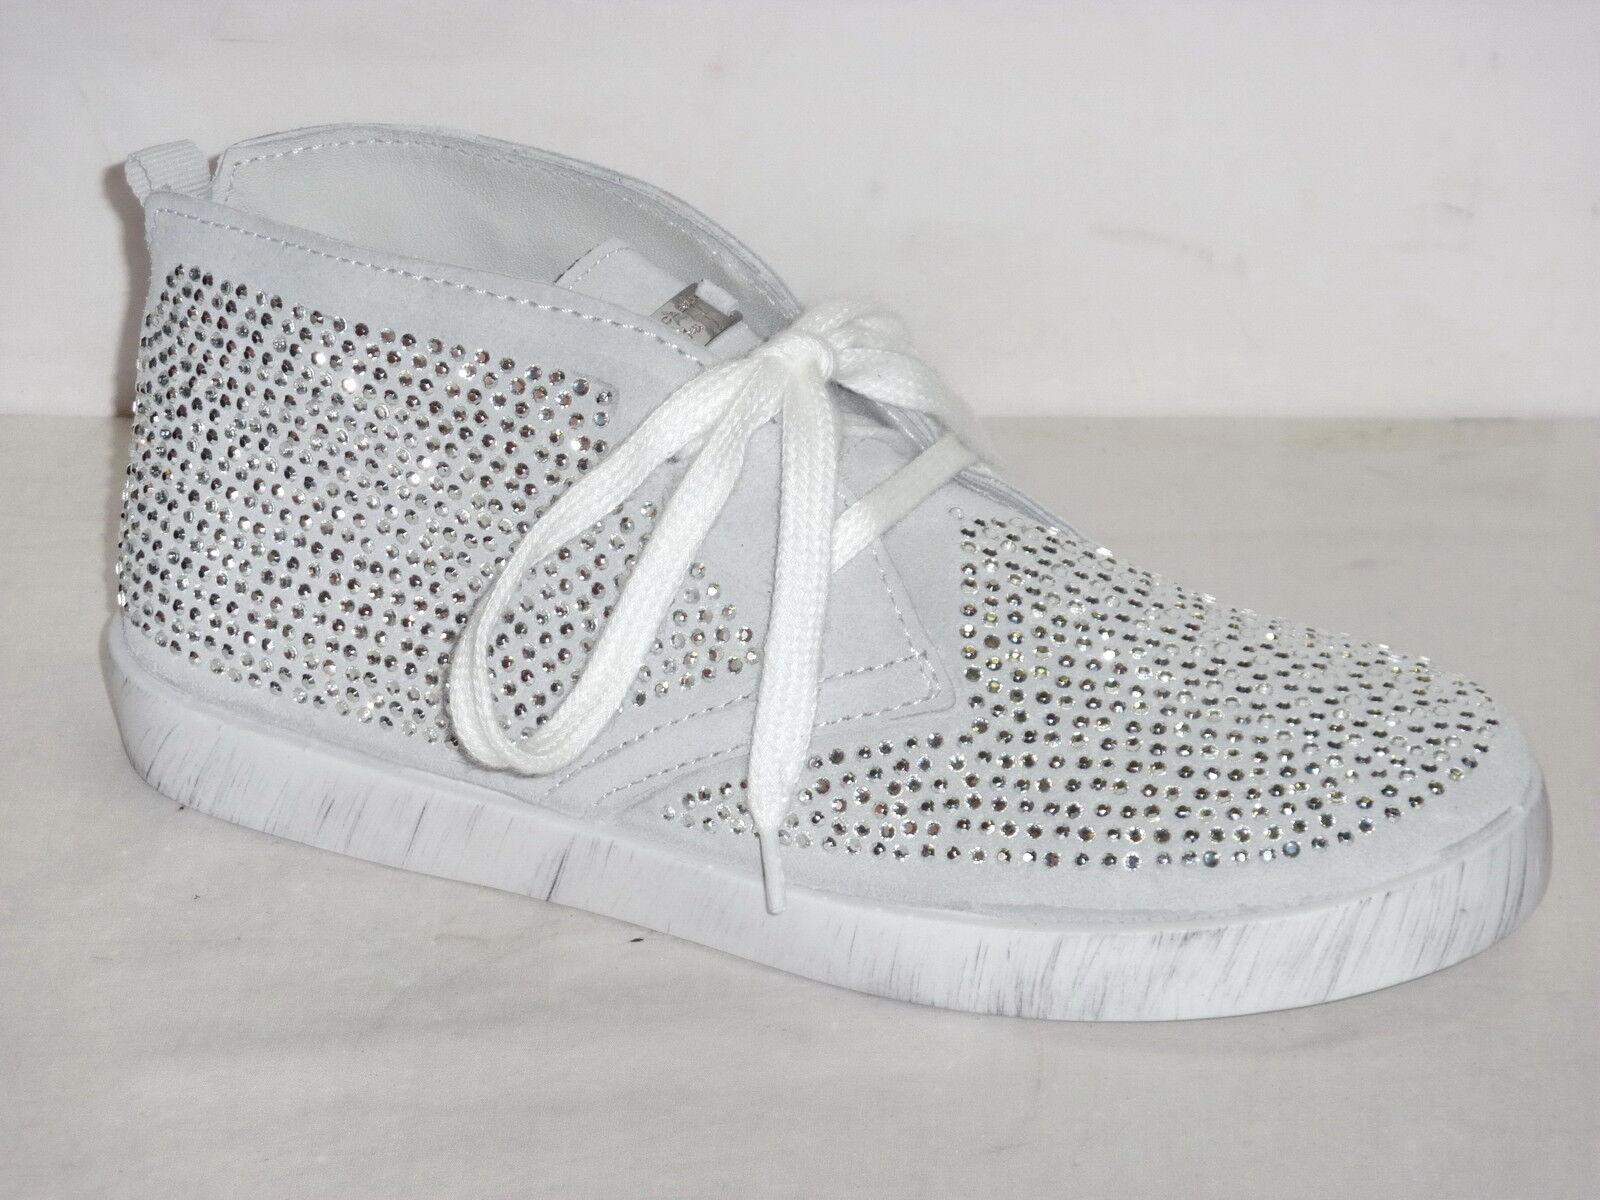 TOSCA azul zapatos TENNIS zapatillas mujer PELLE NABUK gris STRASS STRASS STRASS plata  n.39  toma